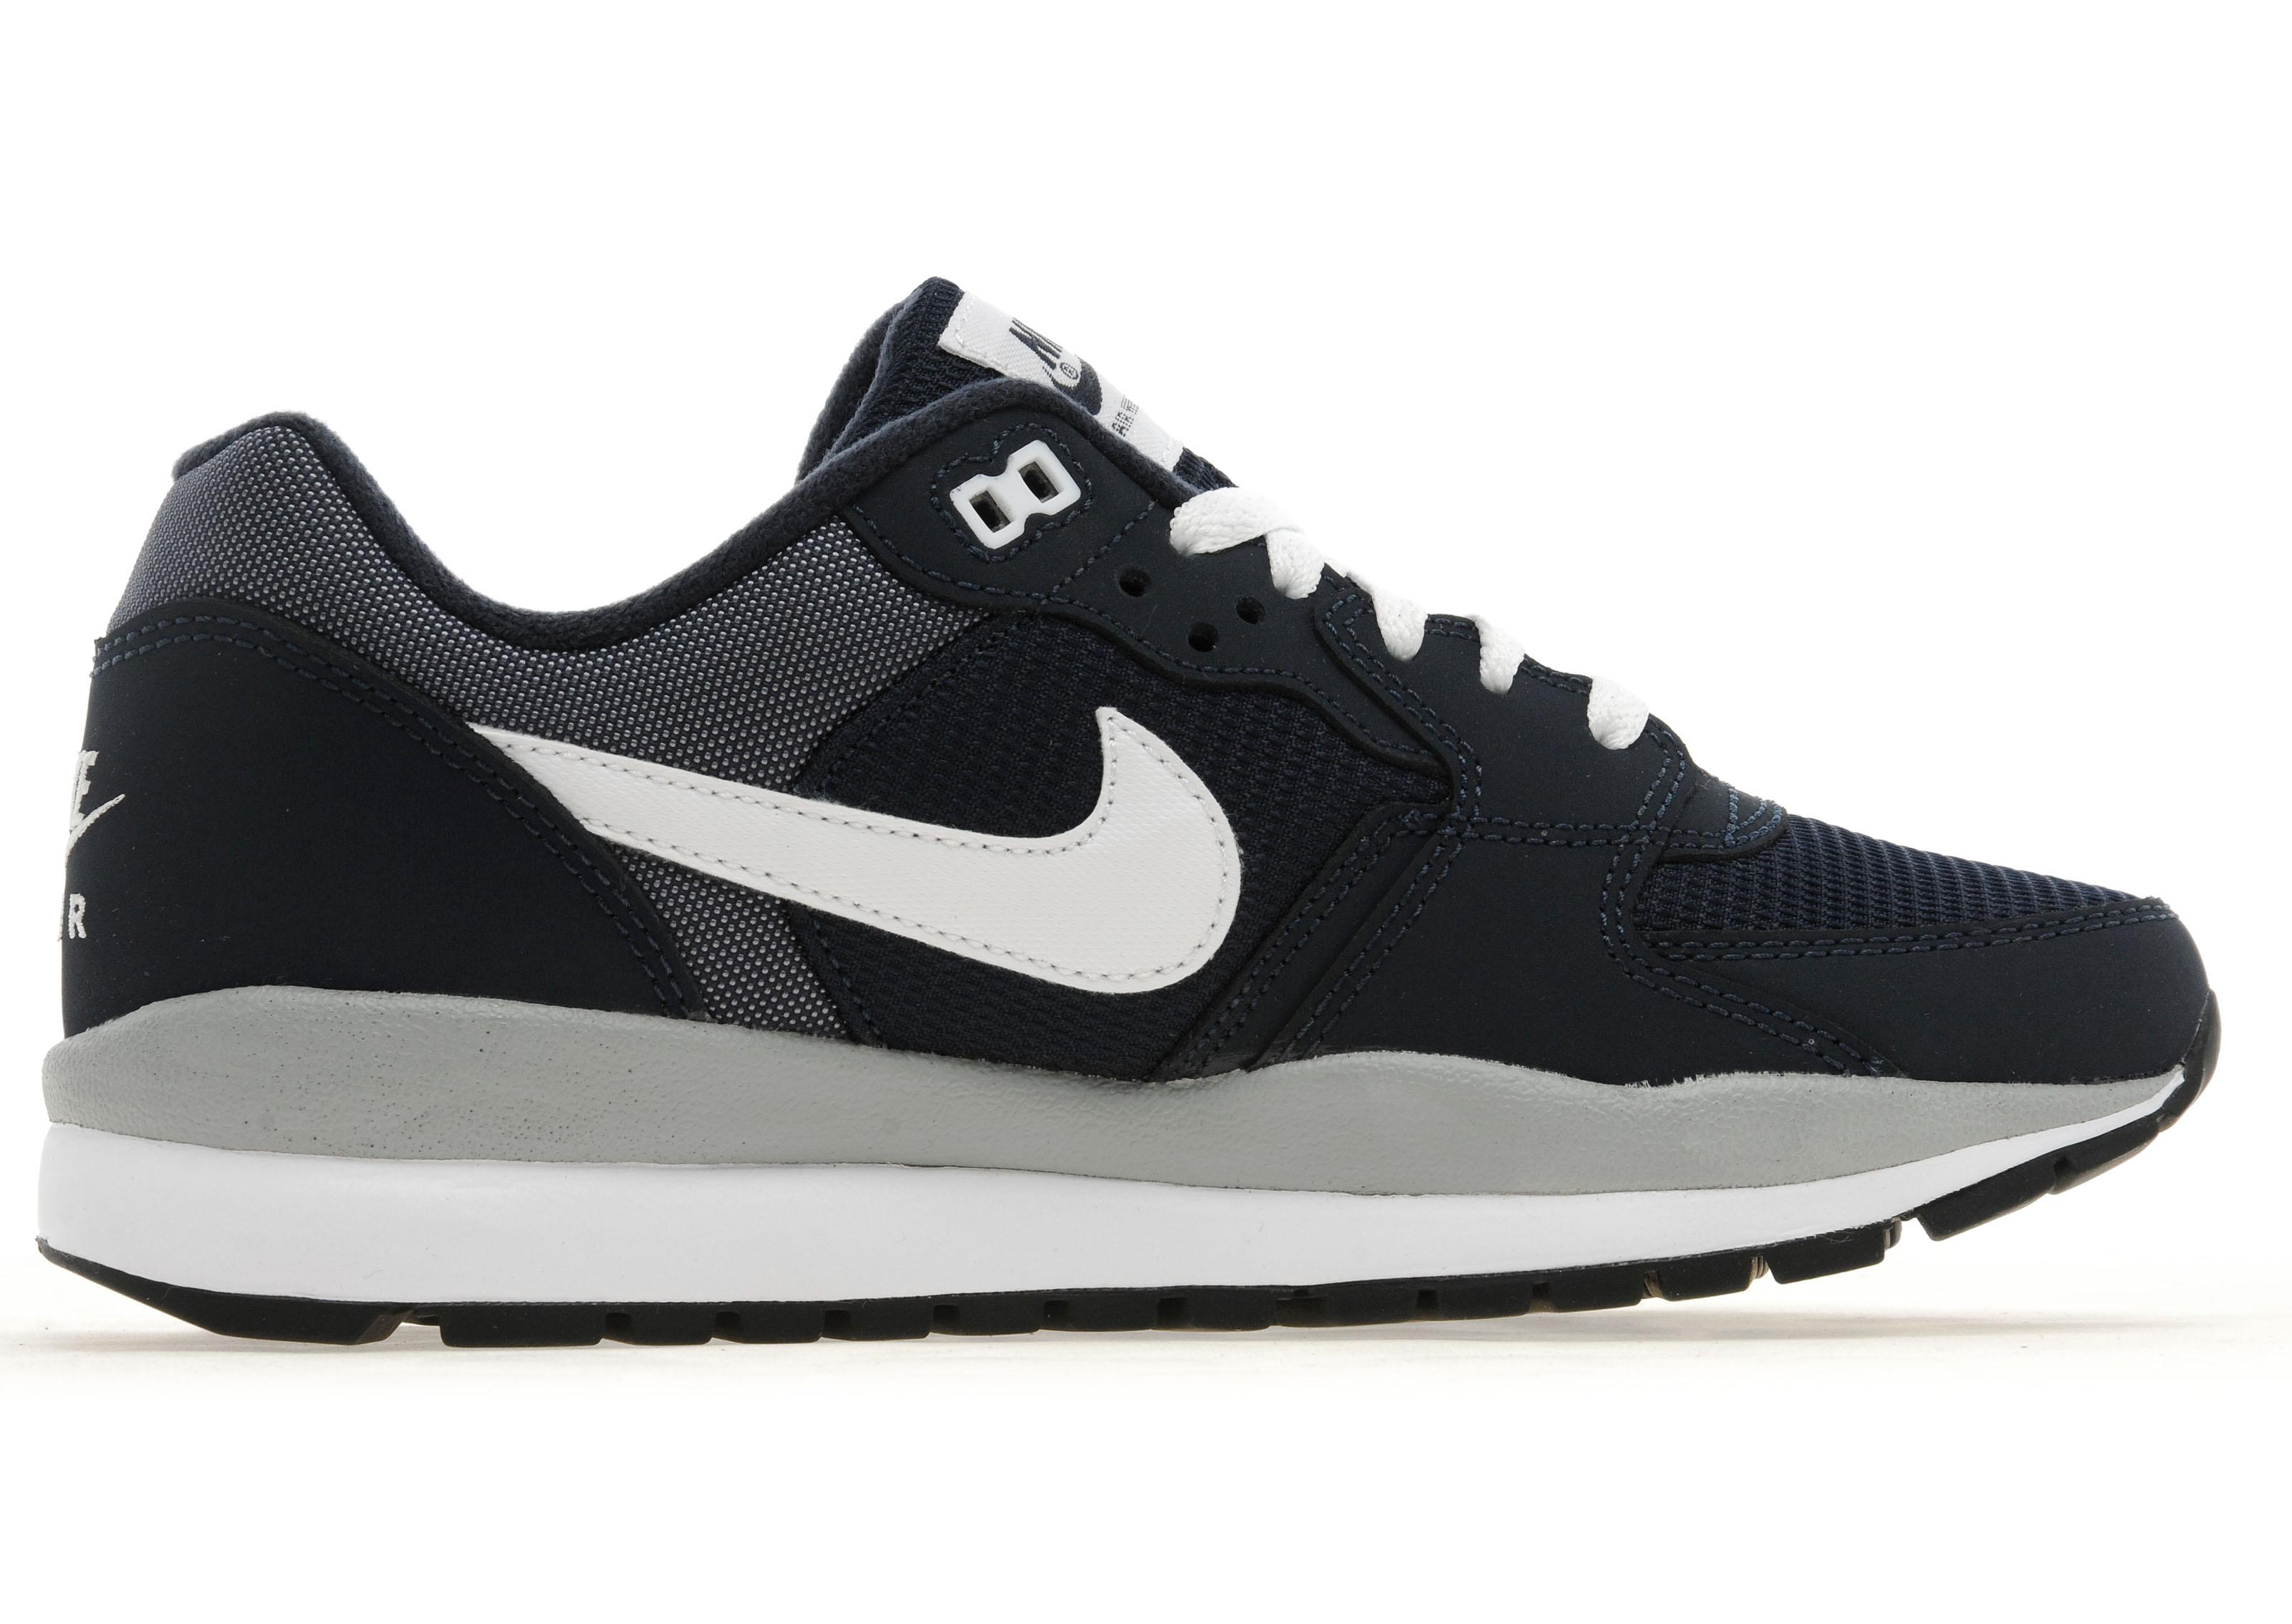 Nike Air Windrunner TR II Black Black White | SneakerFiles